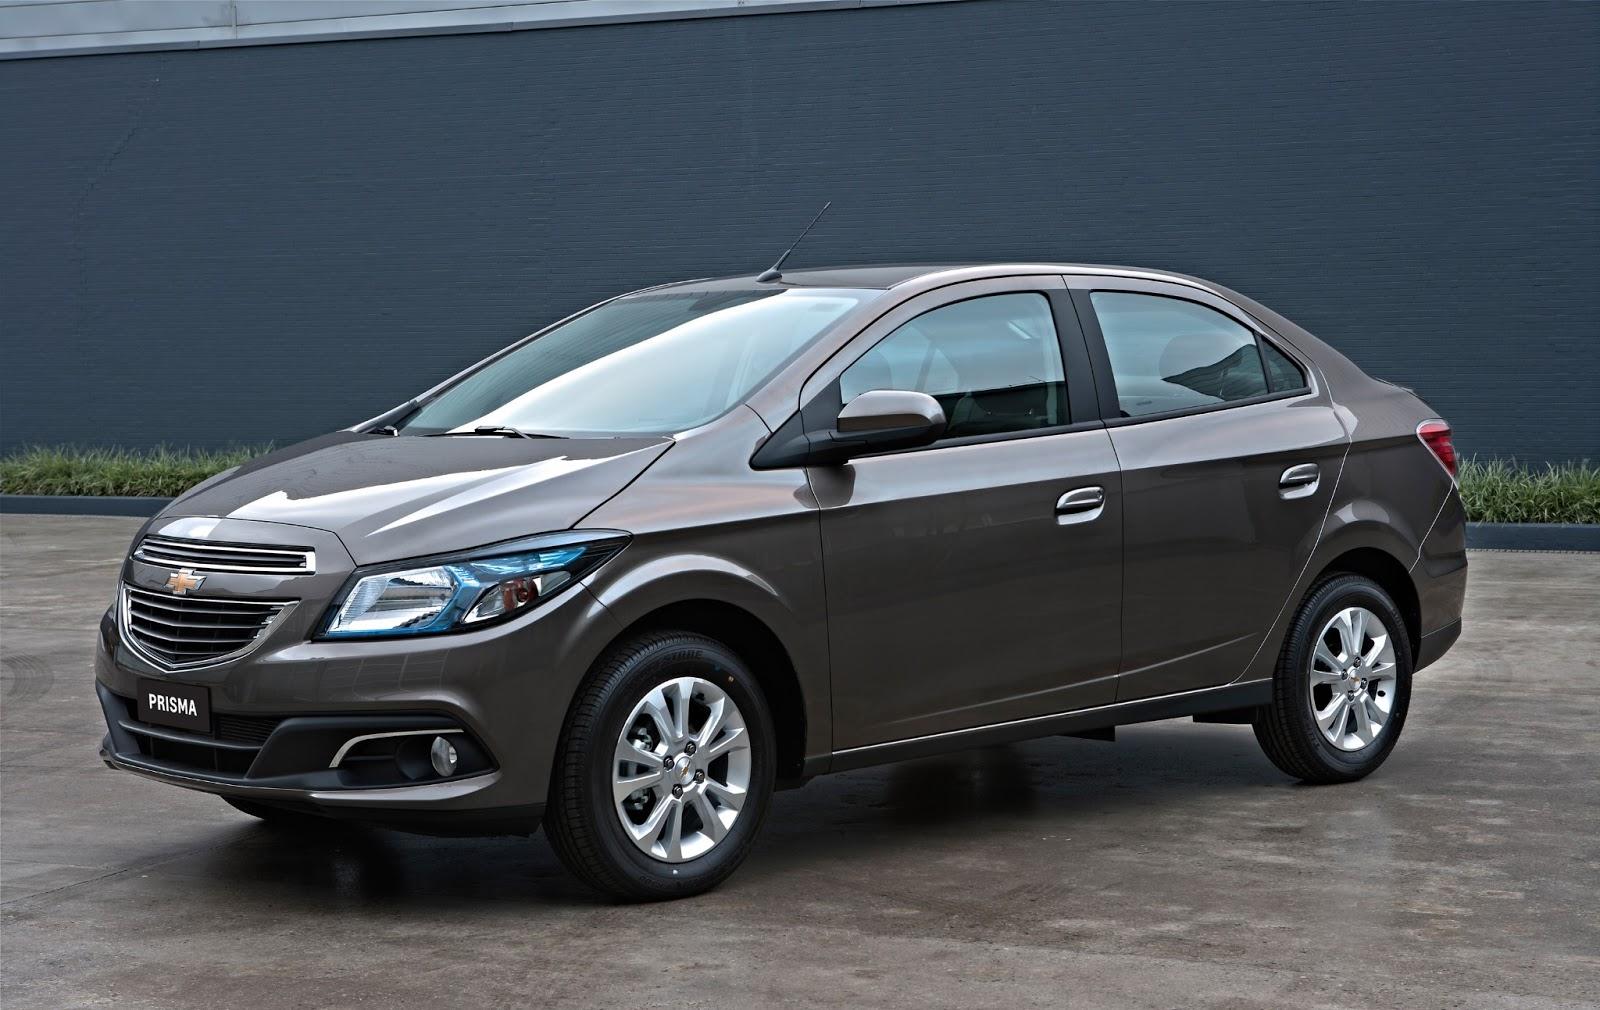 Chevrolet Astra 2013 foto - 4